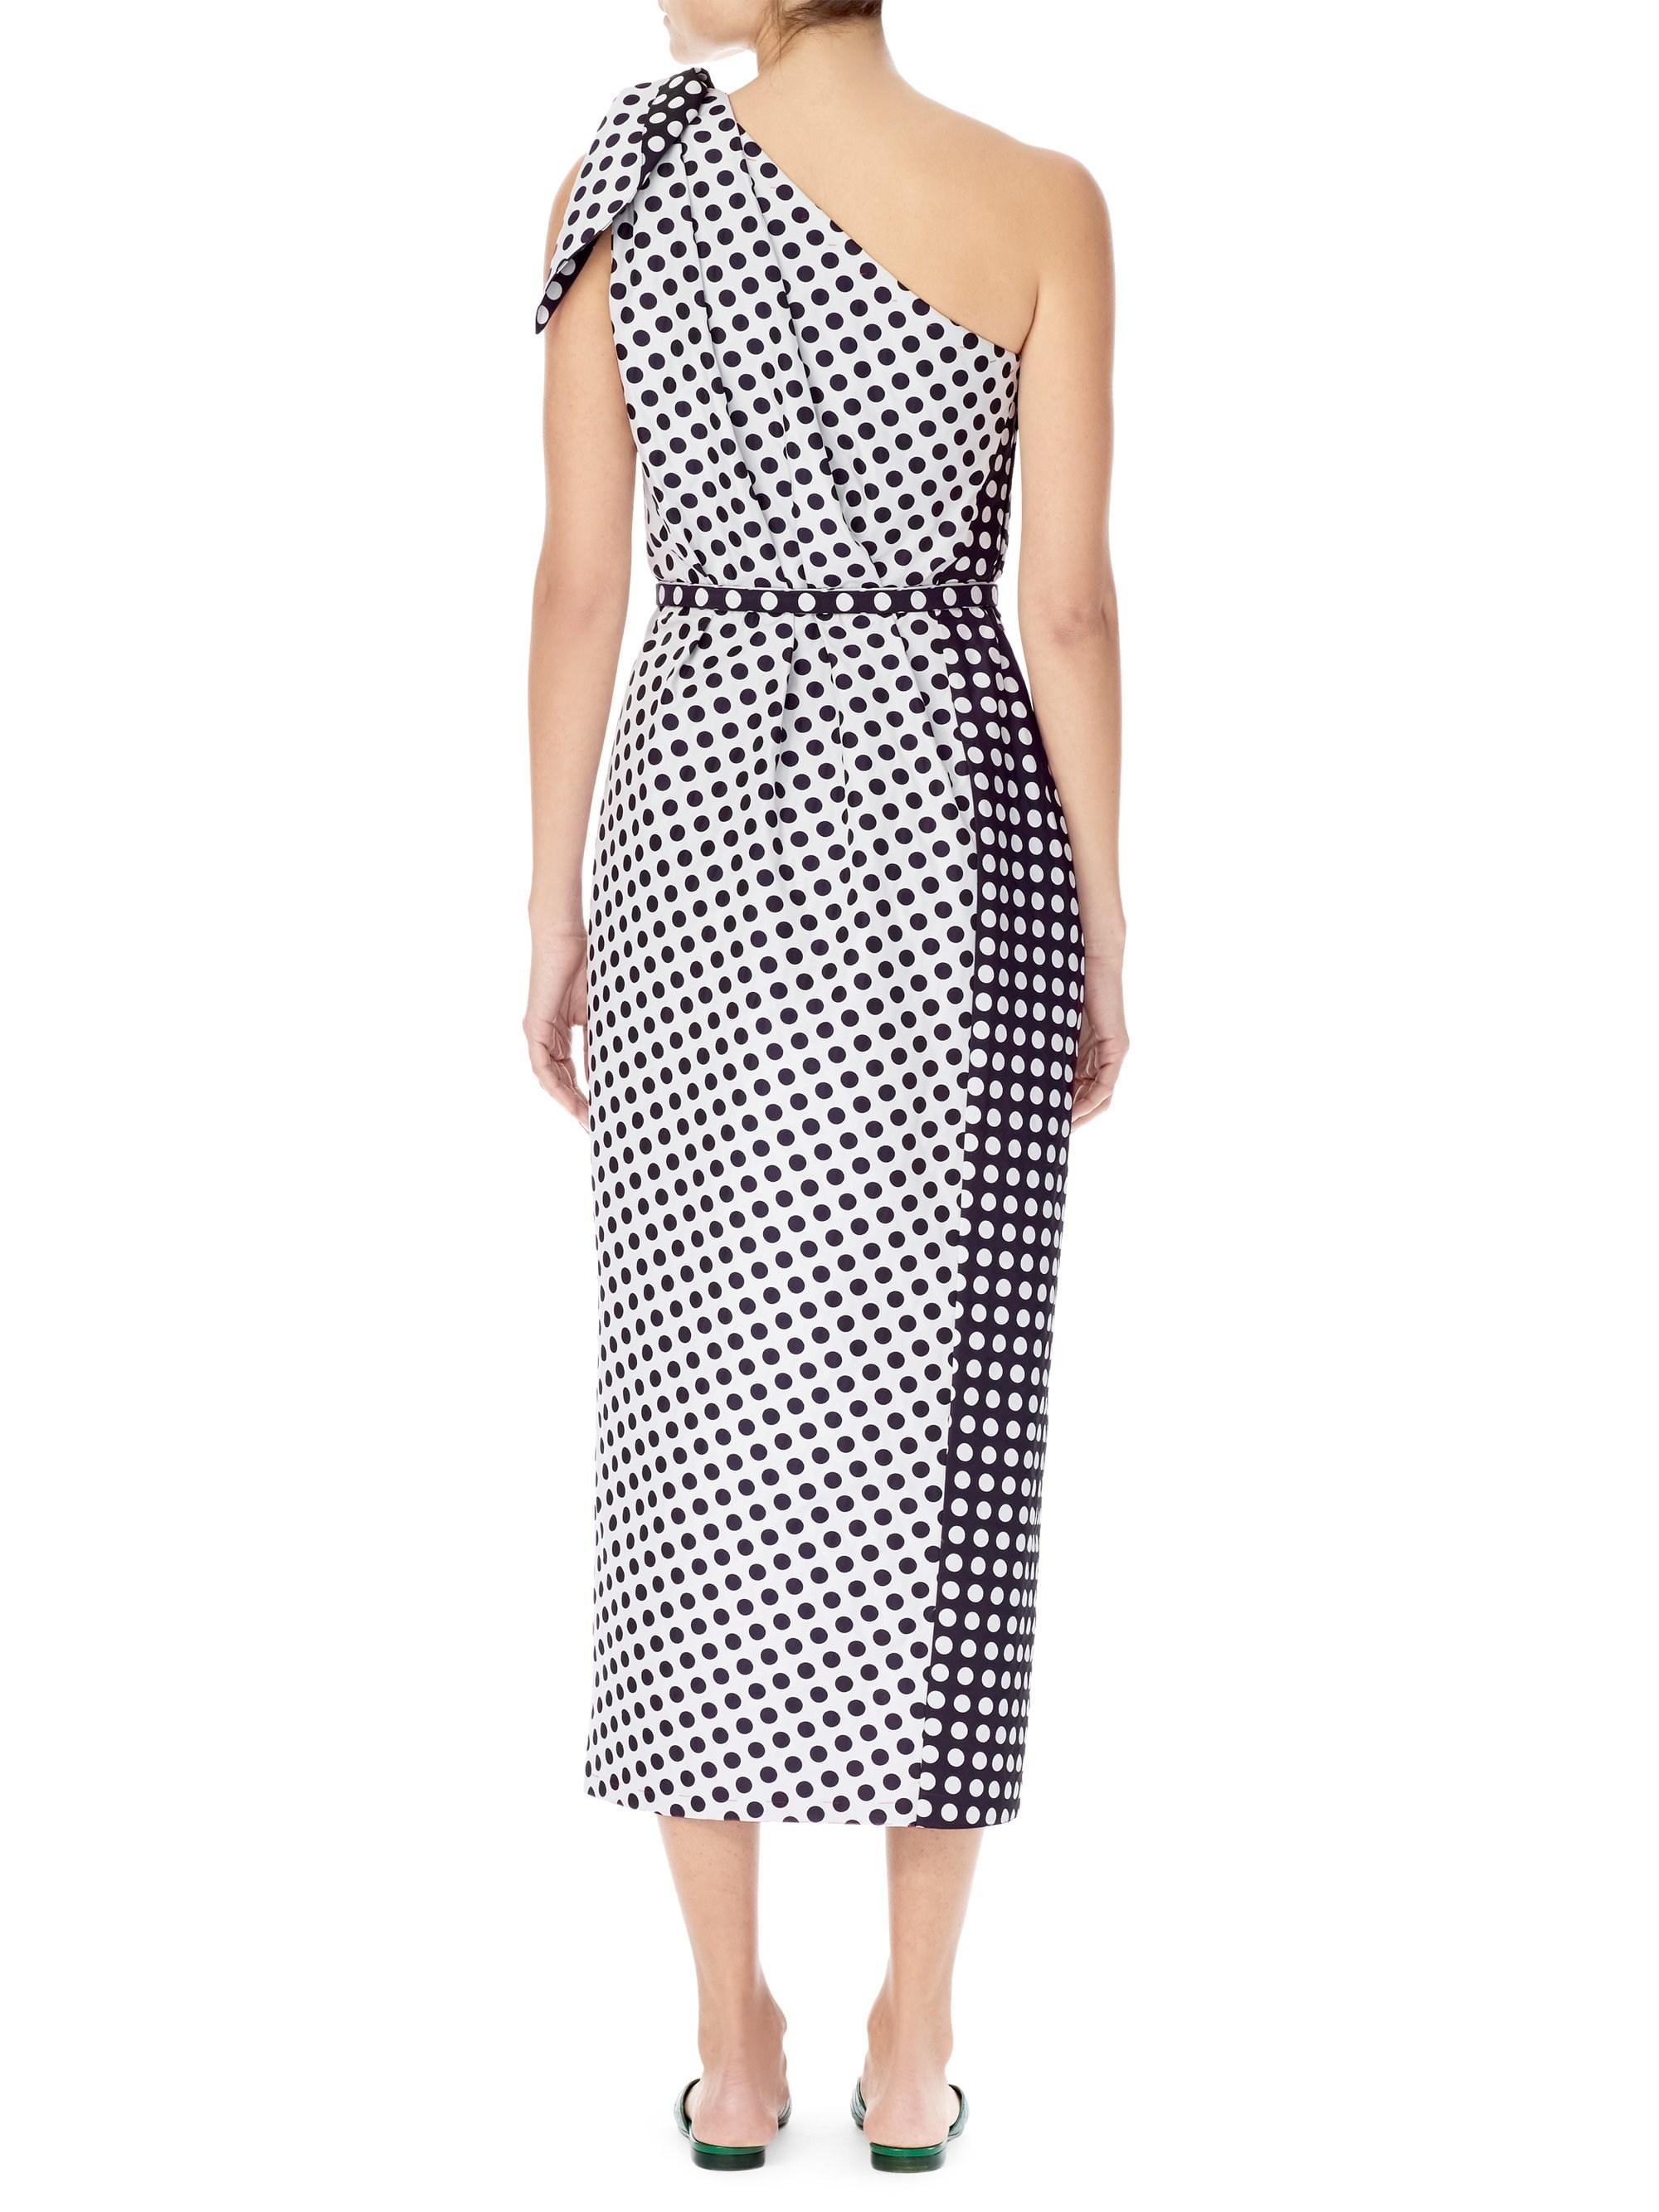 5eae44ed477 Lyst - Carolina Herrera Women s One-shoulder Polka Dot Dress - Midnight  Multi - Size 12